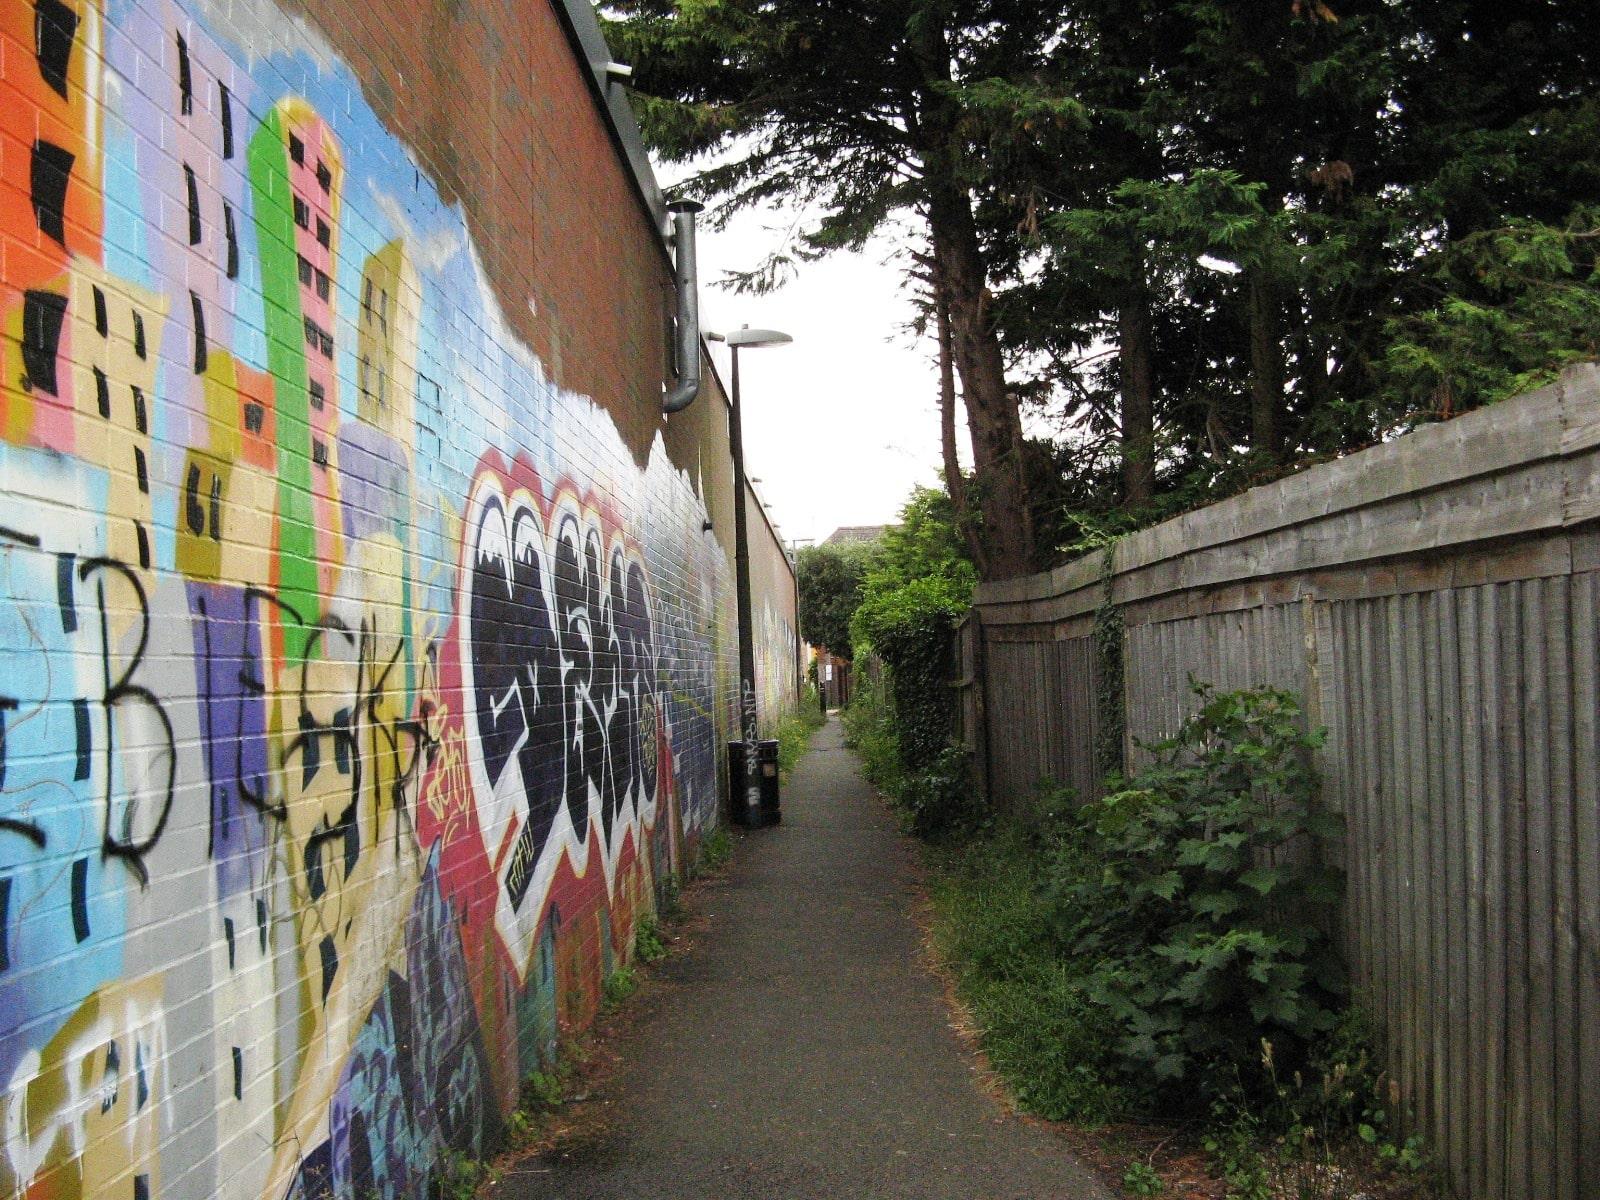 The threatened footpath